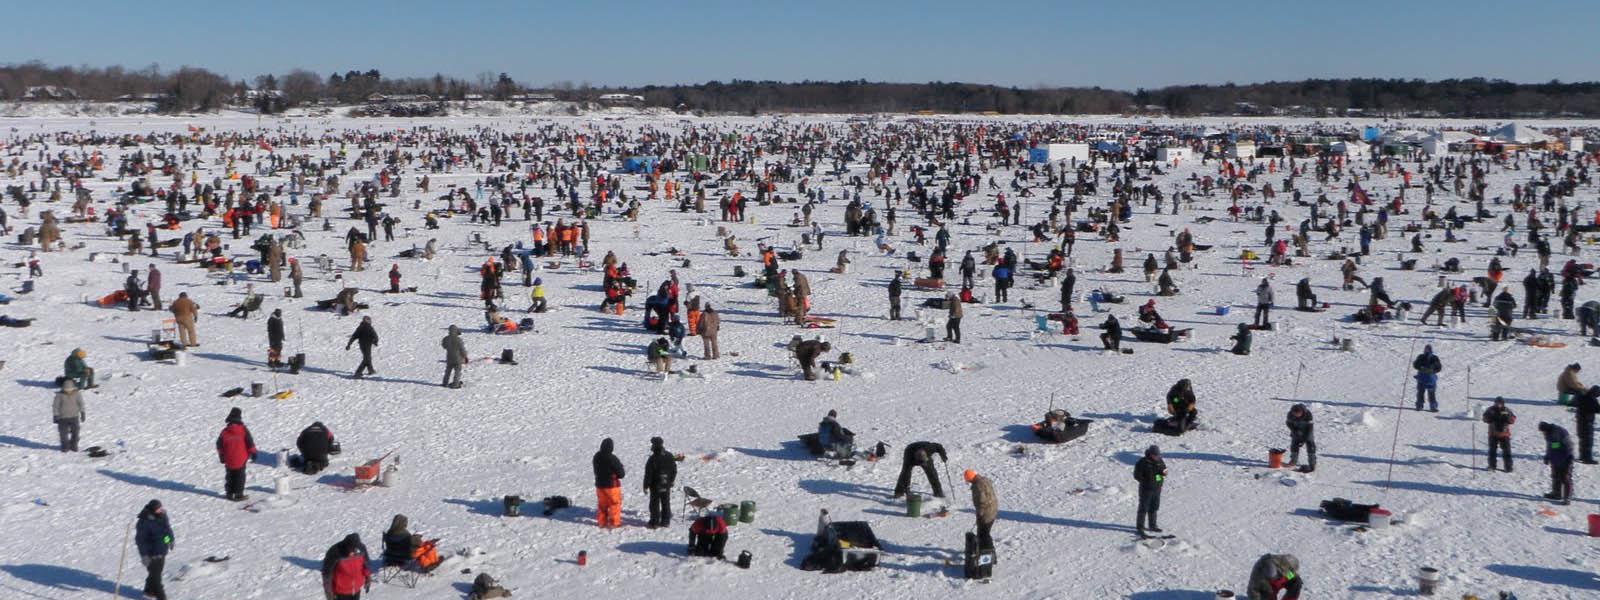 Brainerd Jaycees Ice Fishing Bonanza